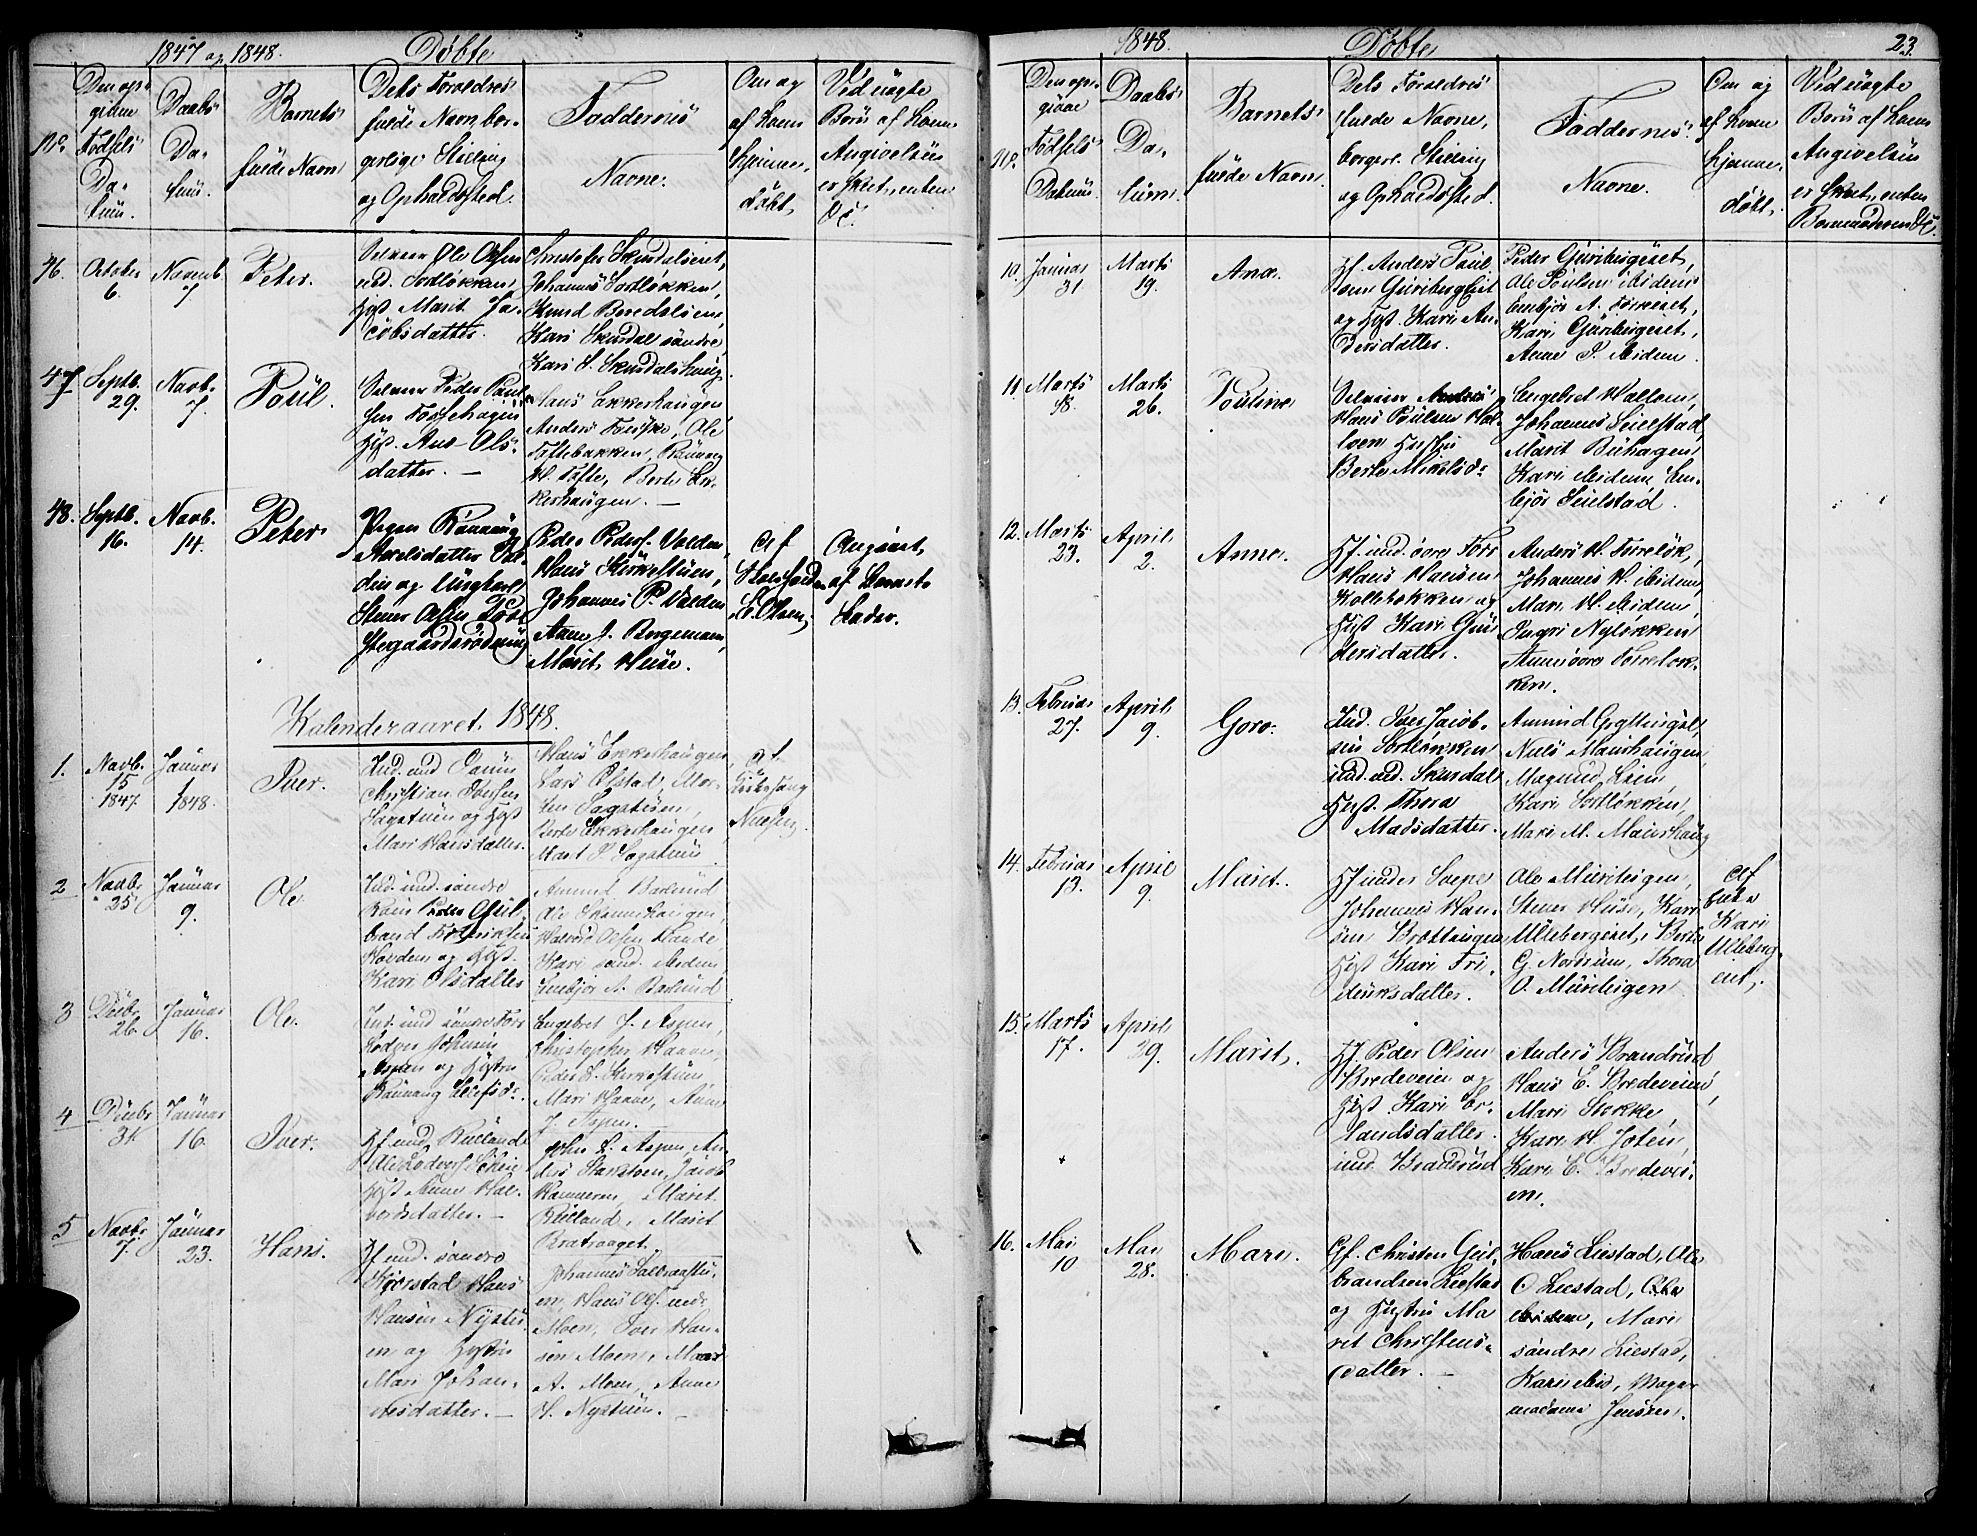 SAH, Sør-Fron prestekontor, H/Ha/Hab/L0001: Klokkerbok nr. 1, 1844-1863, s. 23